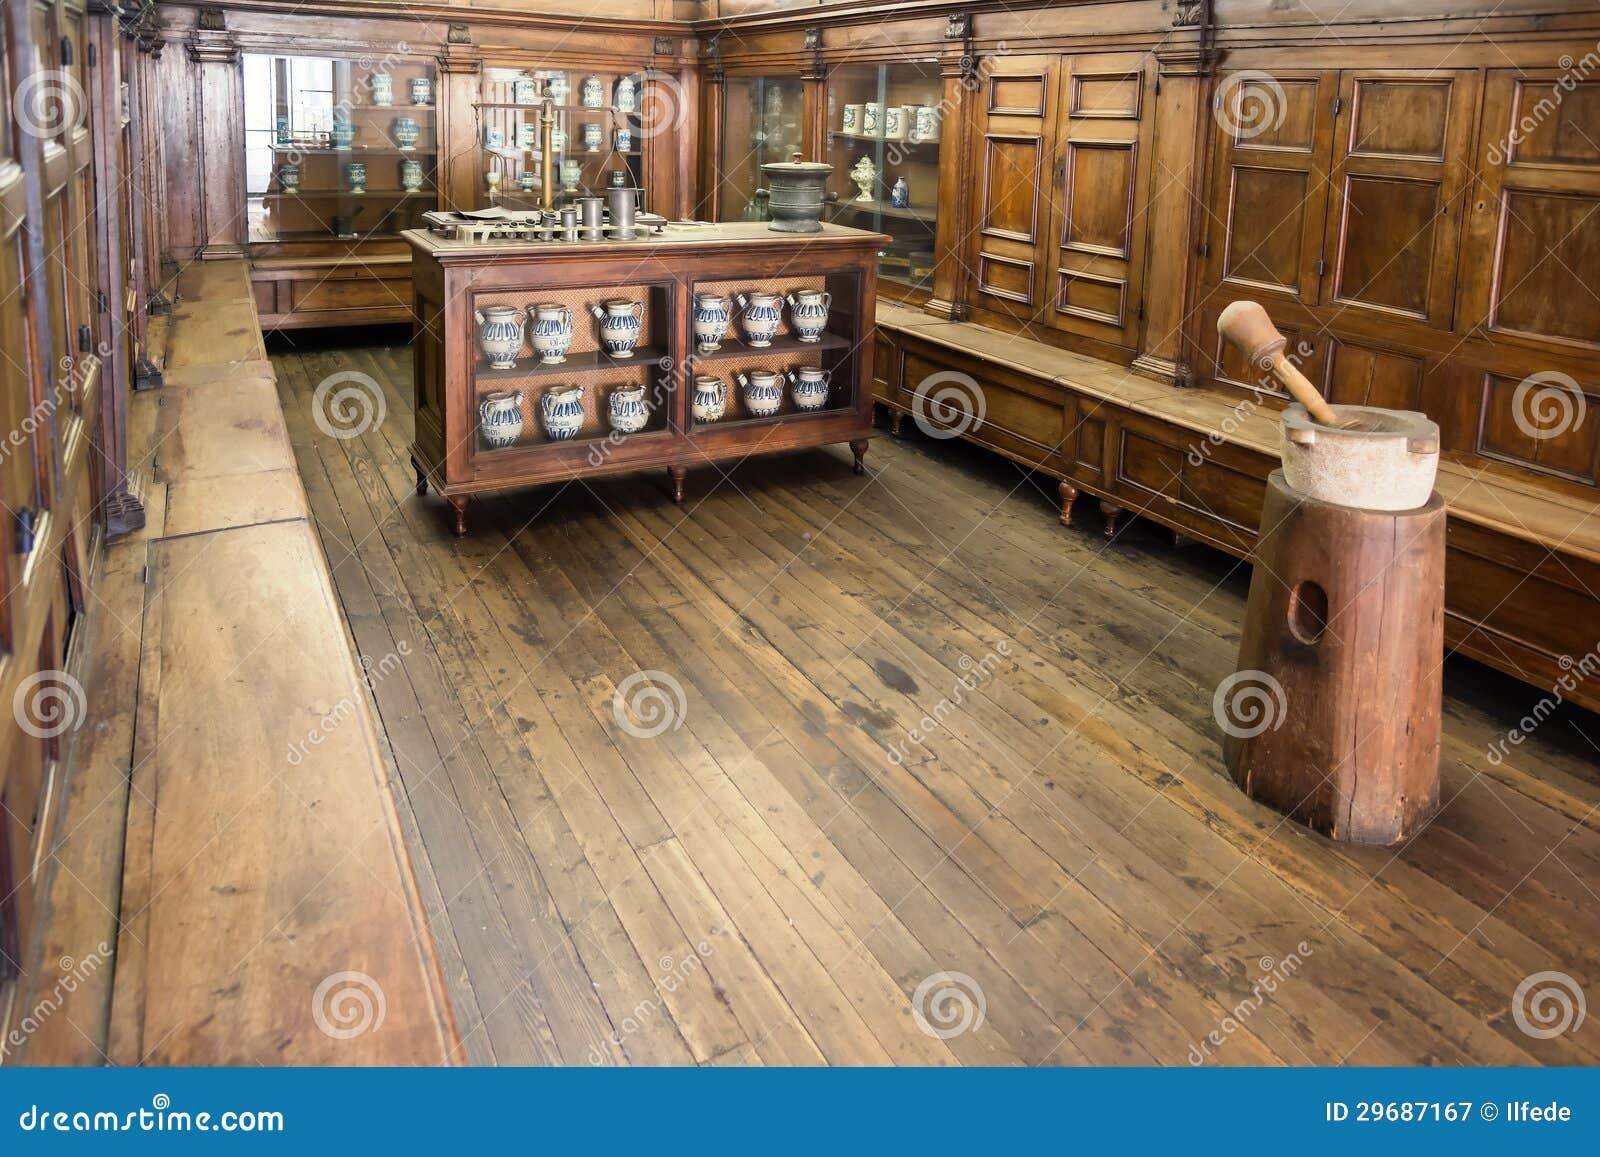 Antique pharmacy laboratory royalty free stock photography image